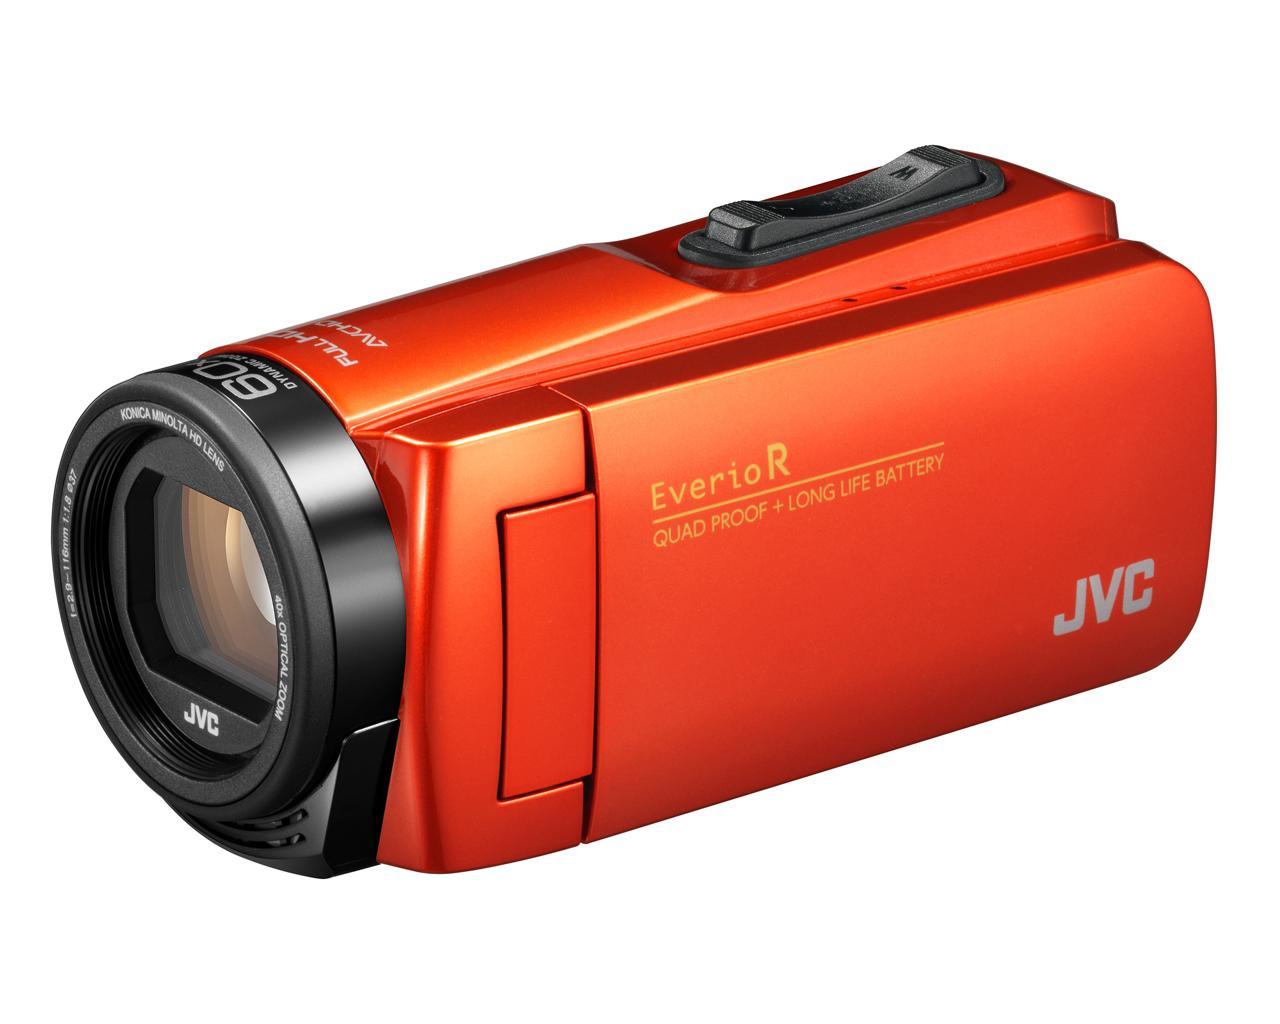 JVC GZ-R495D Handheld camcorder 2.5MP CMOS Full HD Orange